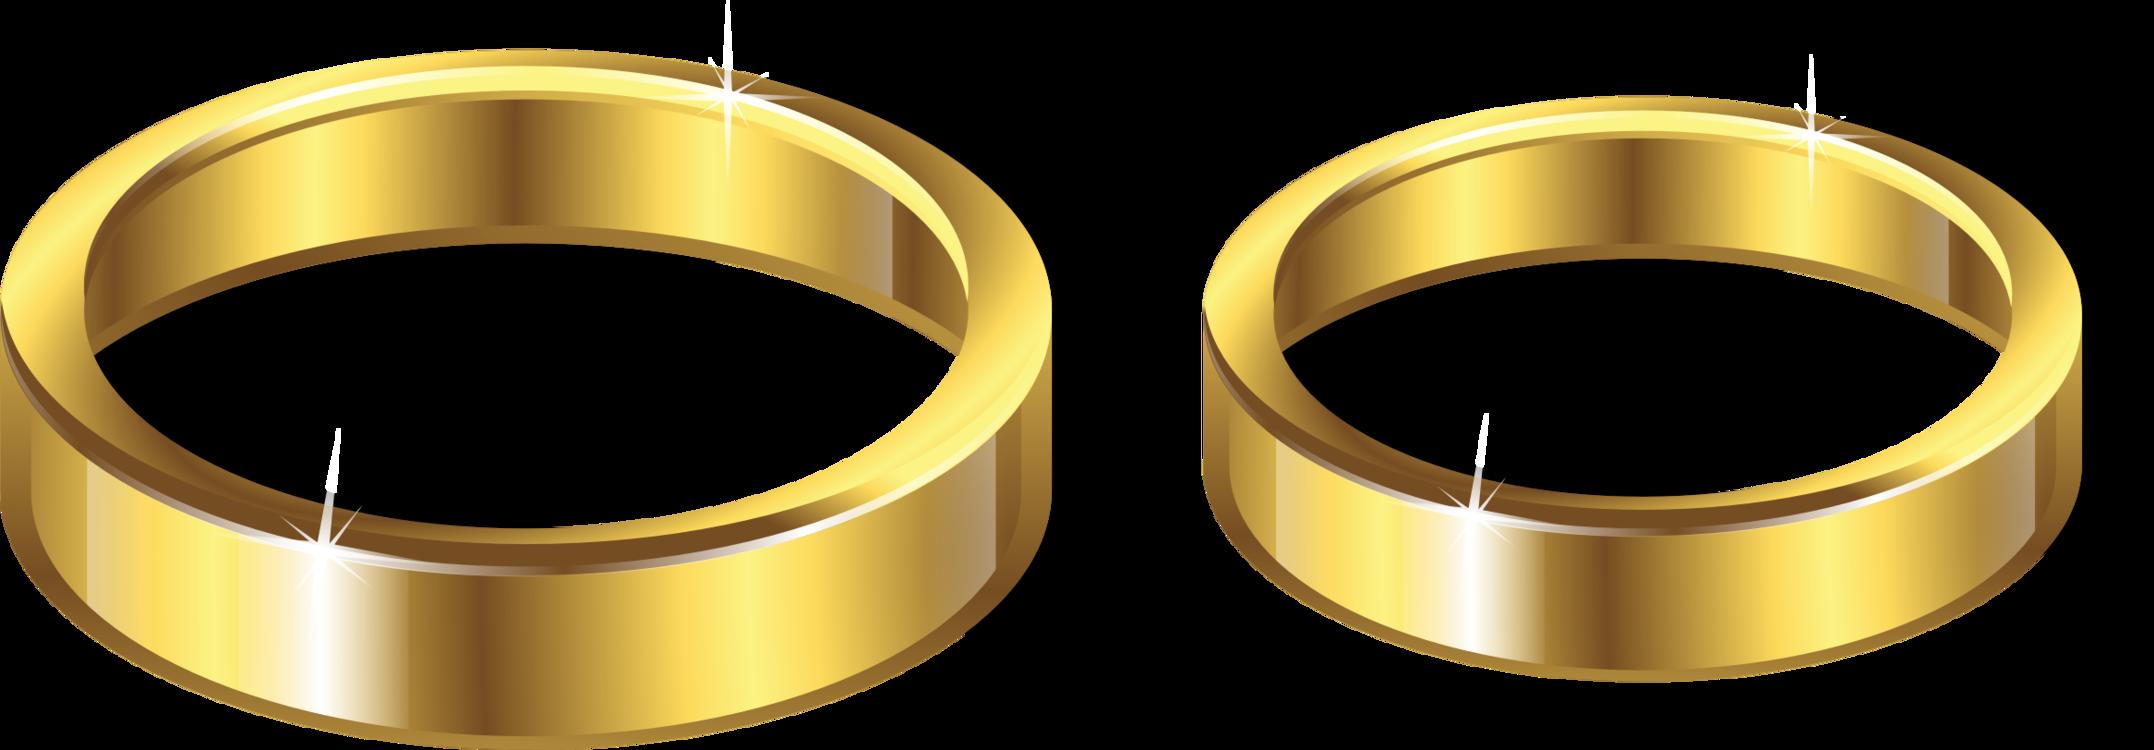 Wedding Ring,Gold,Jewellery